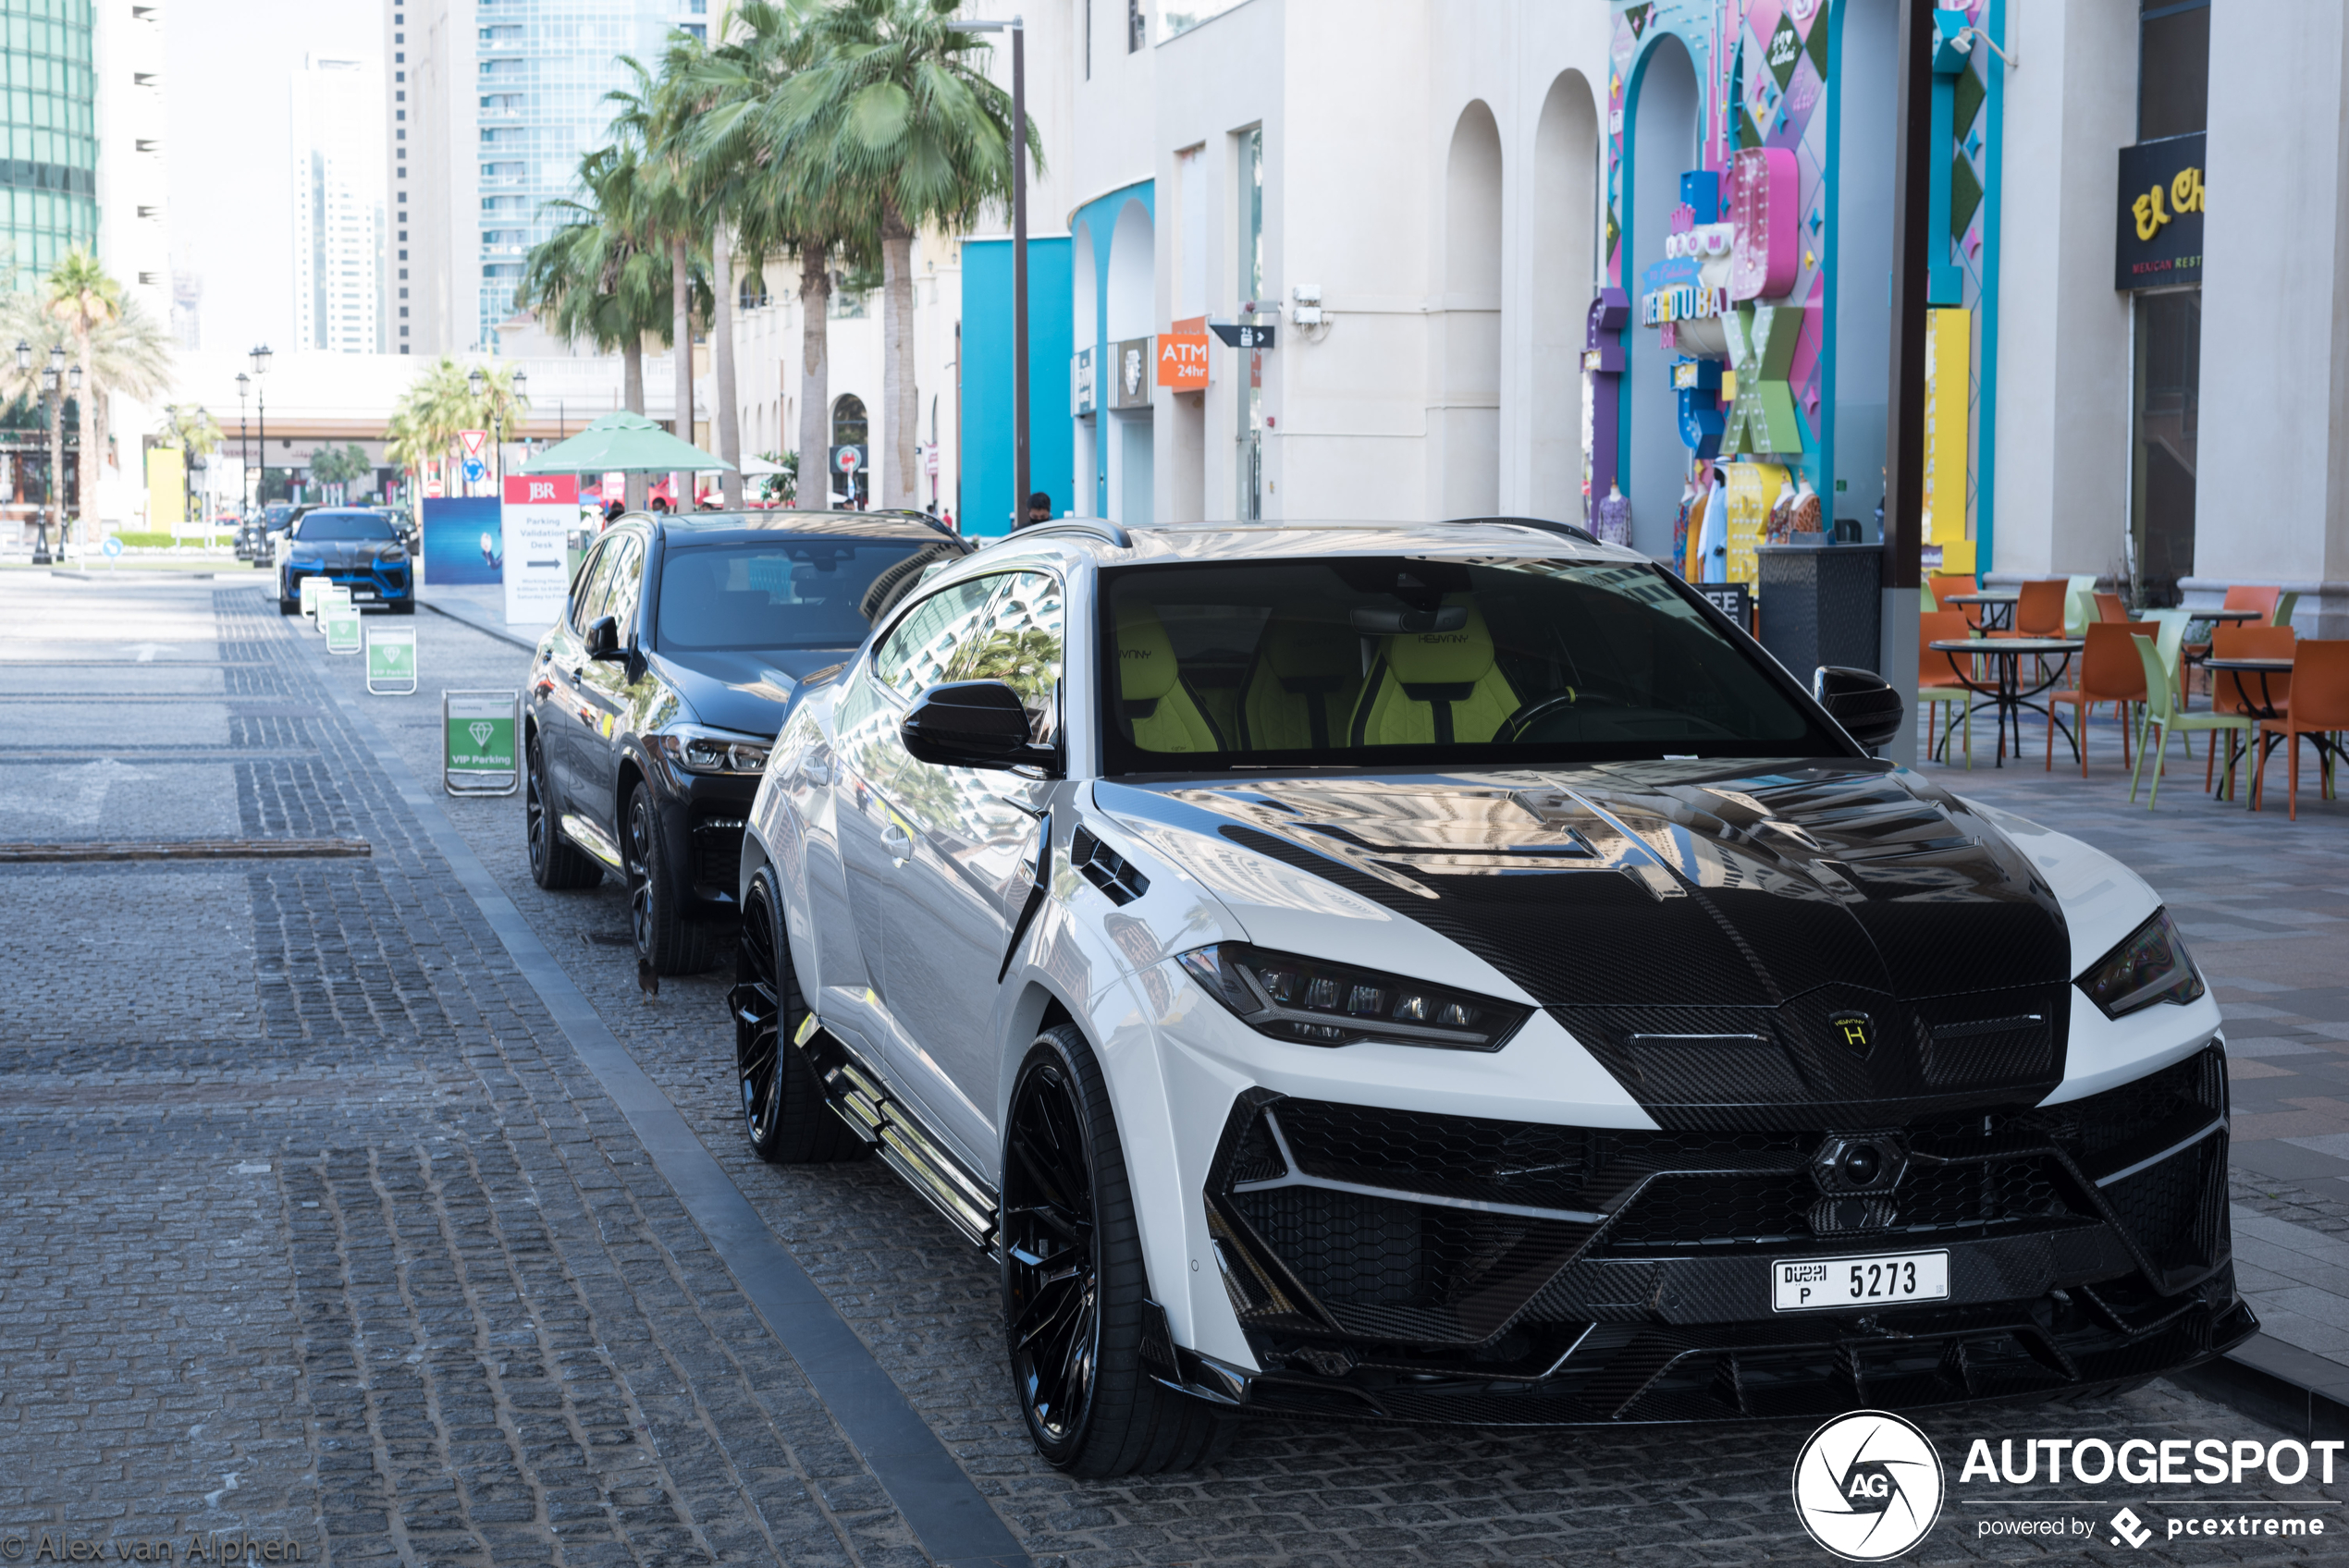 Lamborghini Urus Keyvany Keyrus nu ook te vinden in Dubai